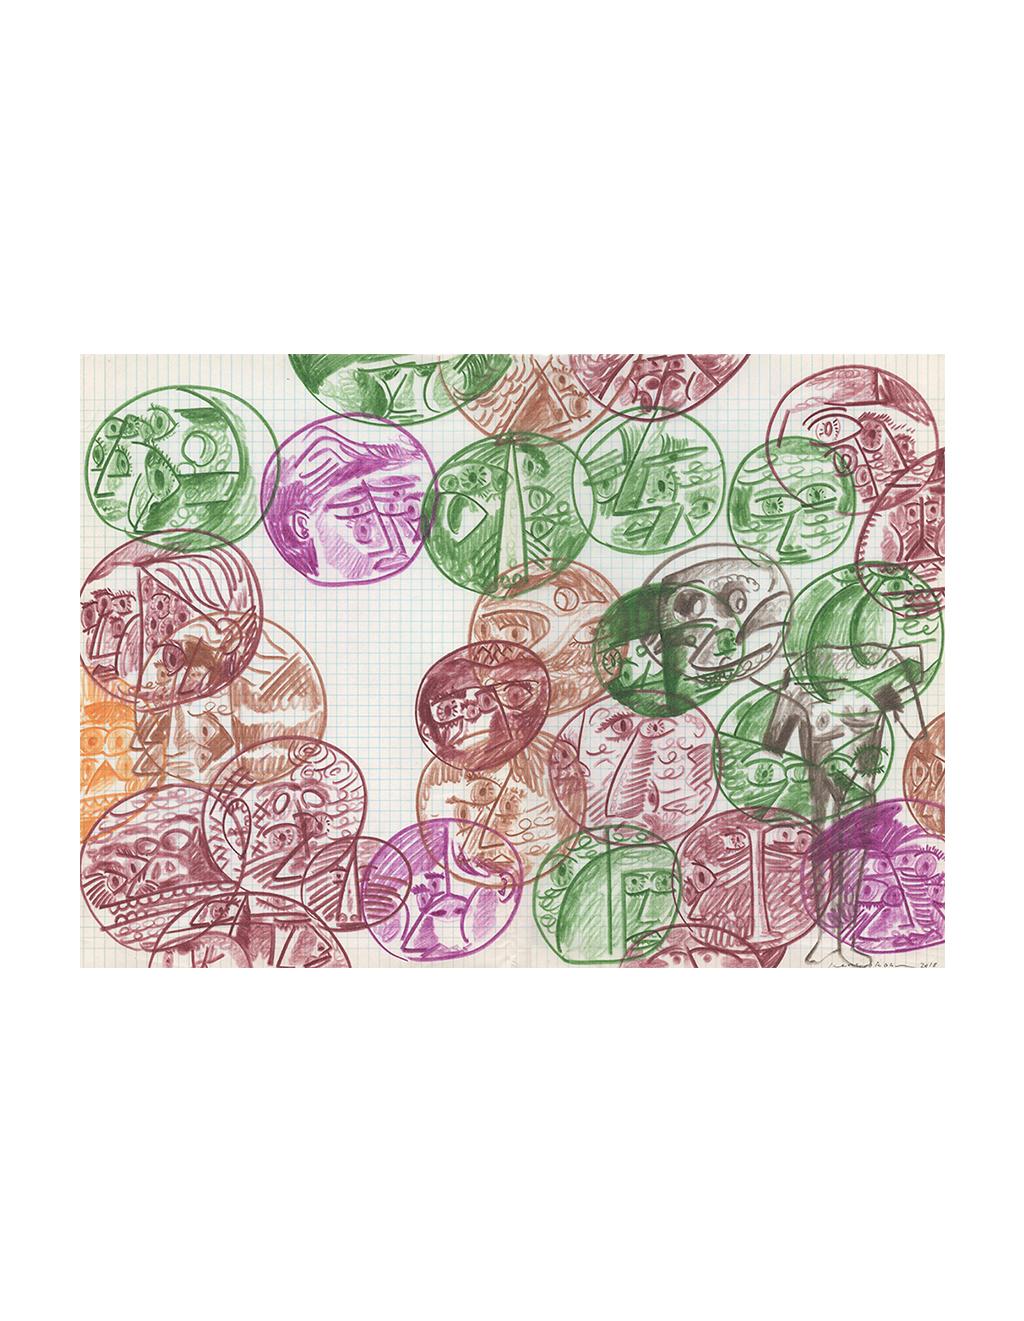 Drawings - Times,   2018  42cm x 29.5cm  Colour pencils on paper